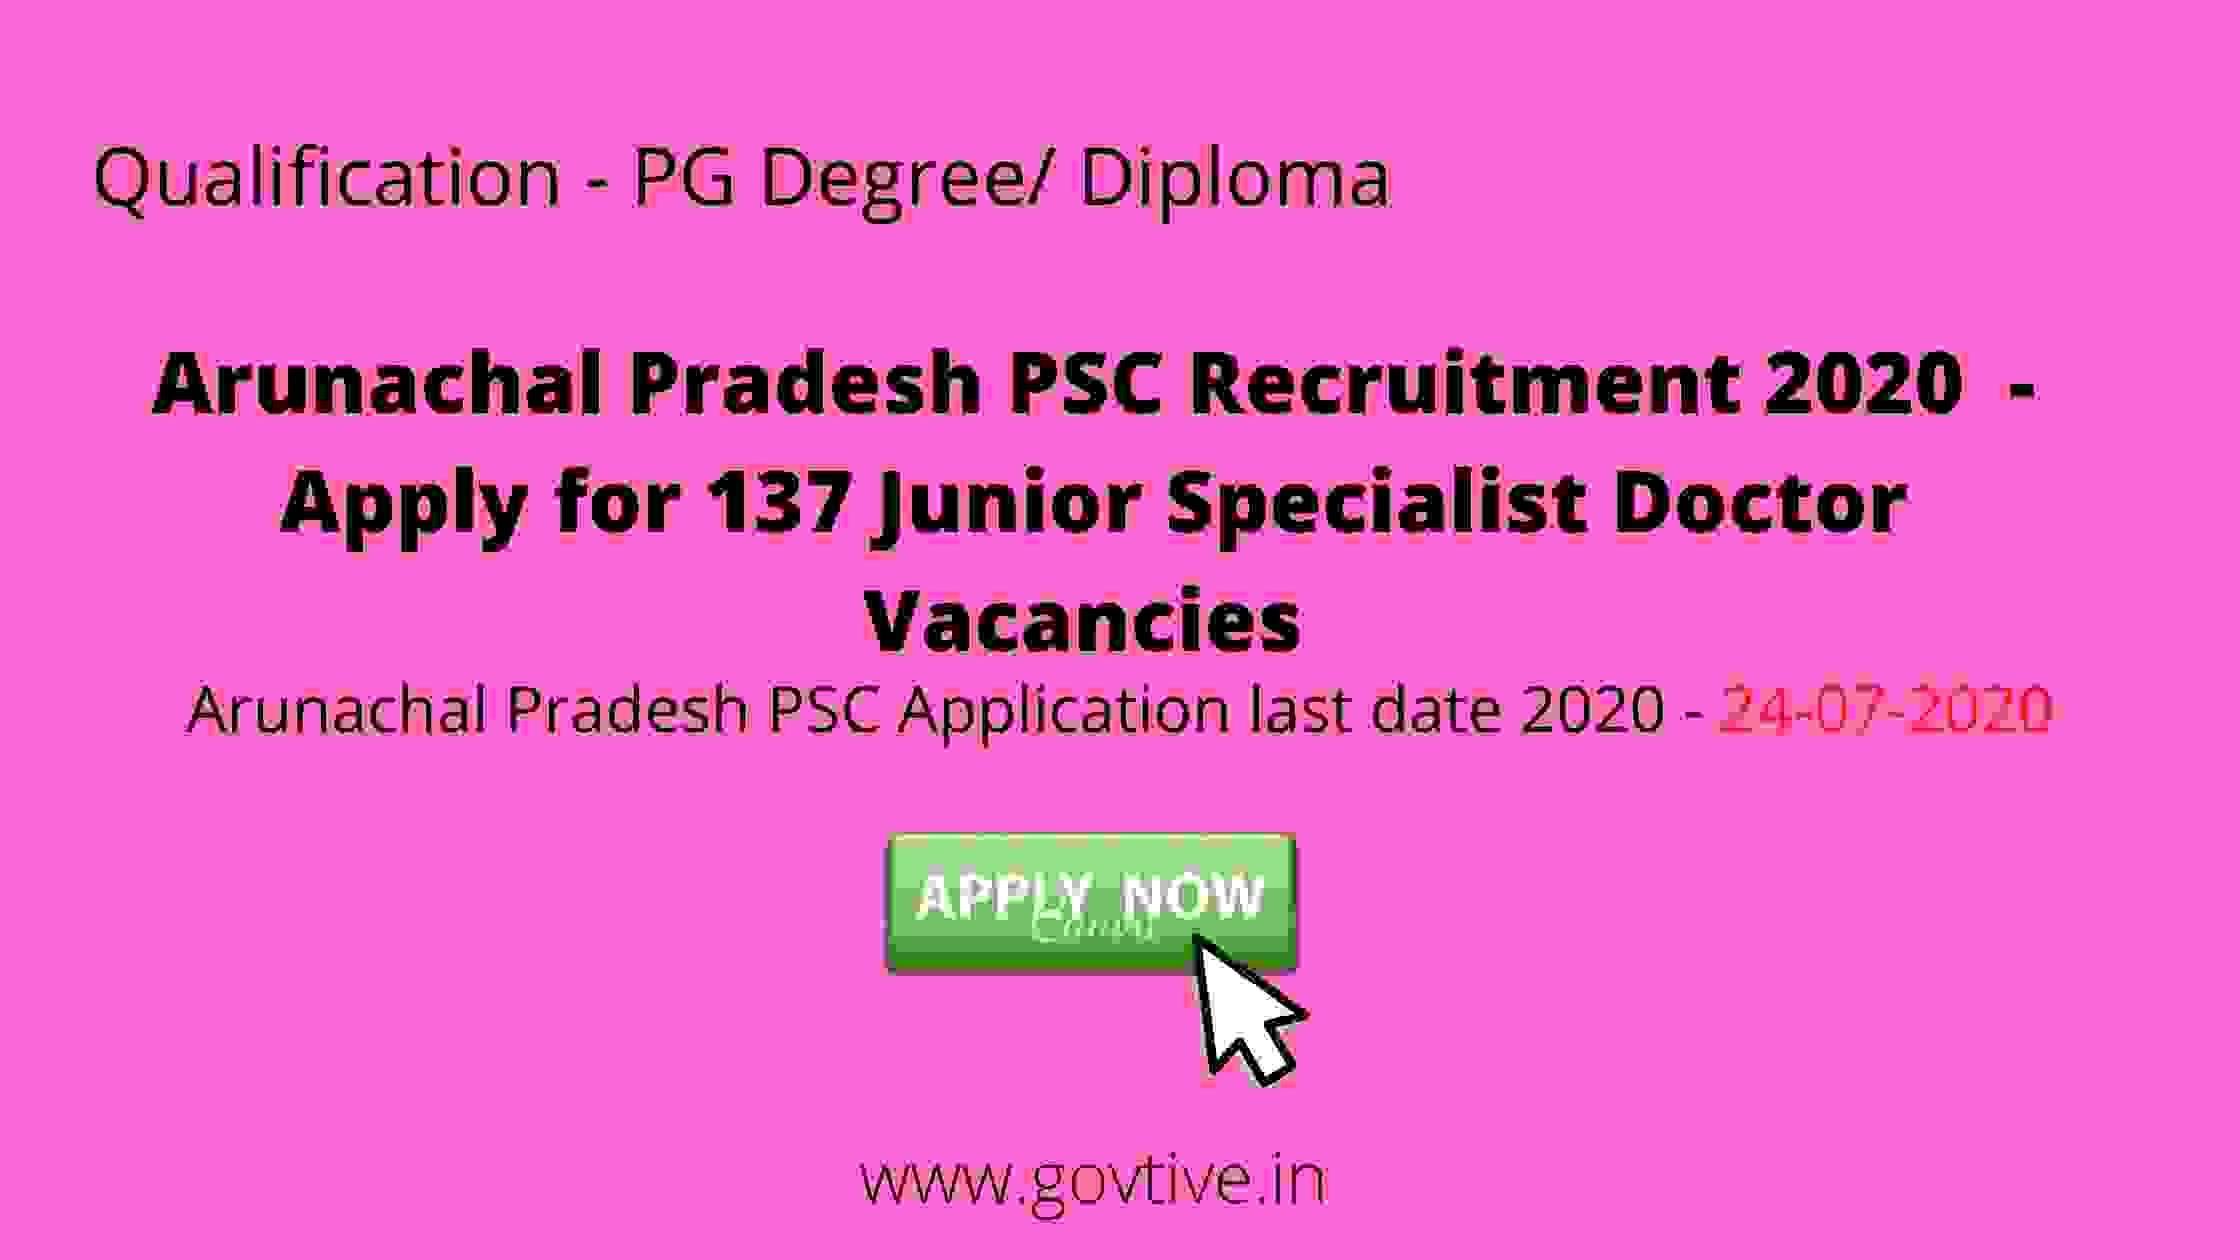 Arunachal Pradesh PSC Recruitment 2020  - Apply for 137 Junior Specialist Doctor Vacancies | government of Arunachal Pradesh |